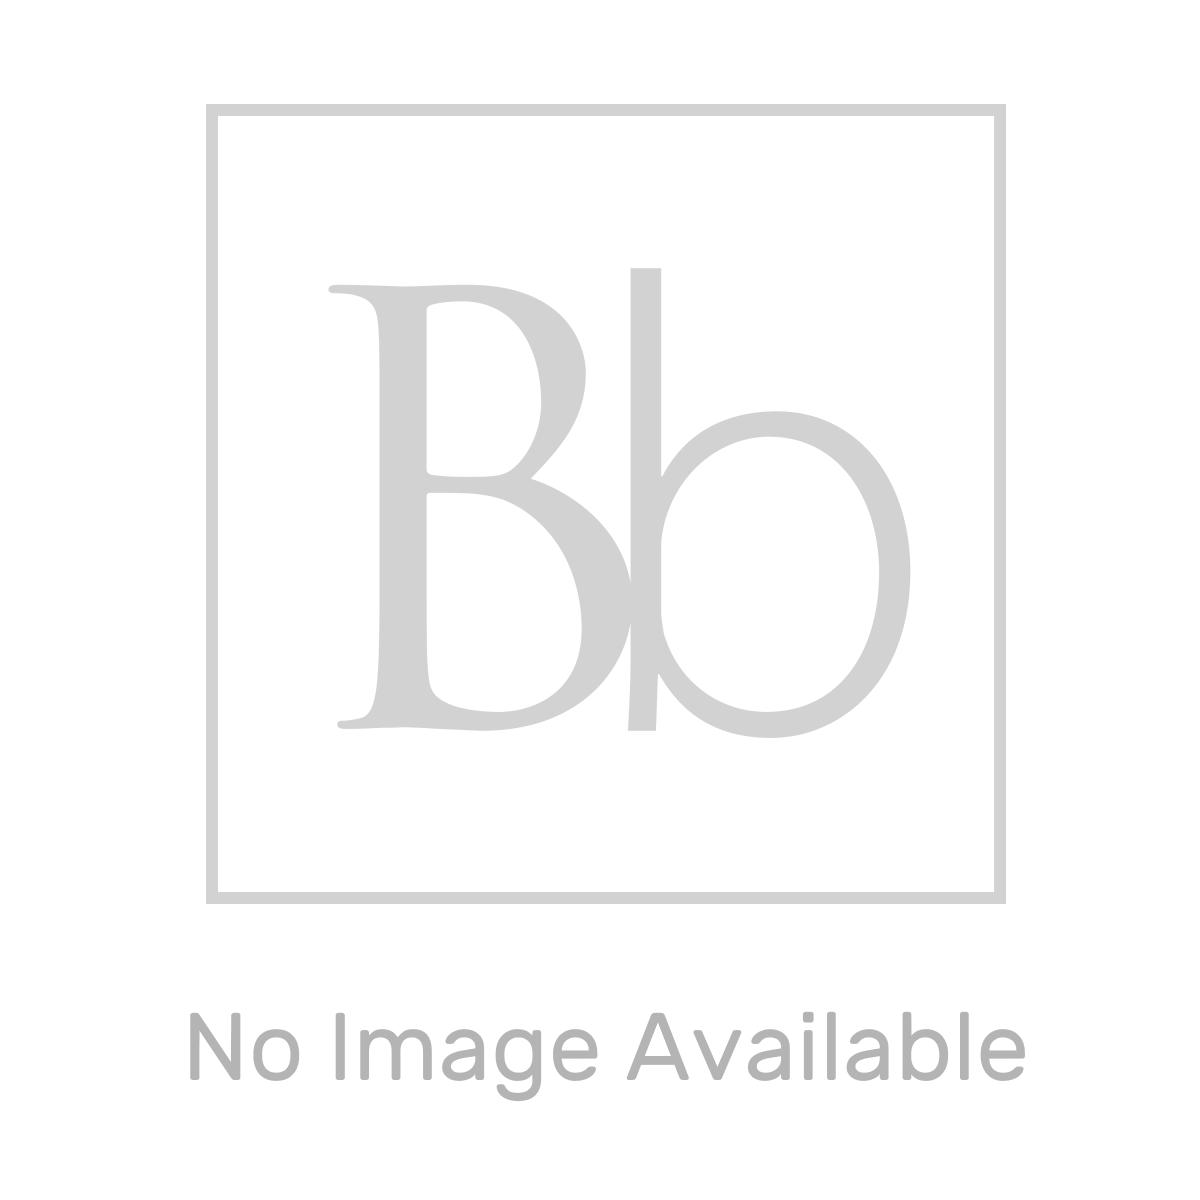 Kartell Astley Matt White Front Bath Panel 1700mm Lifestyle